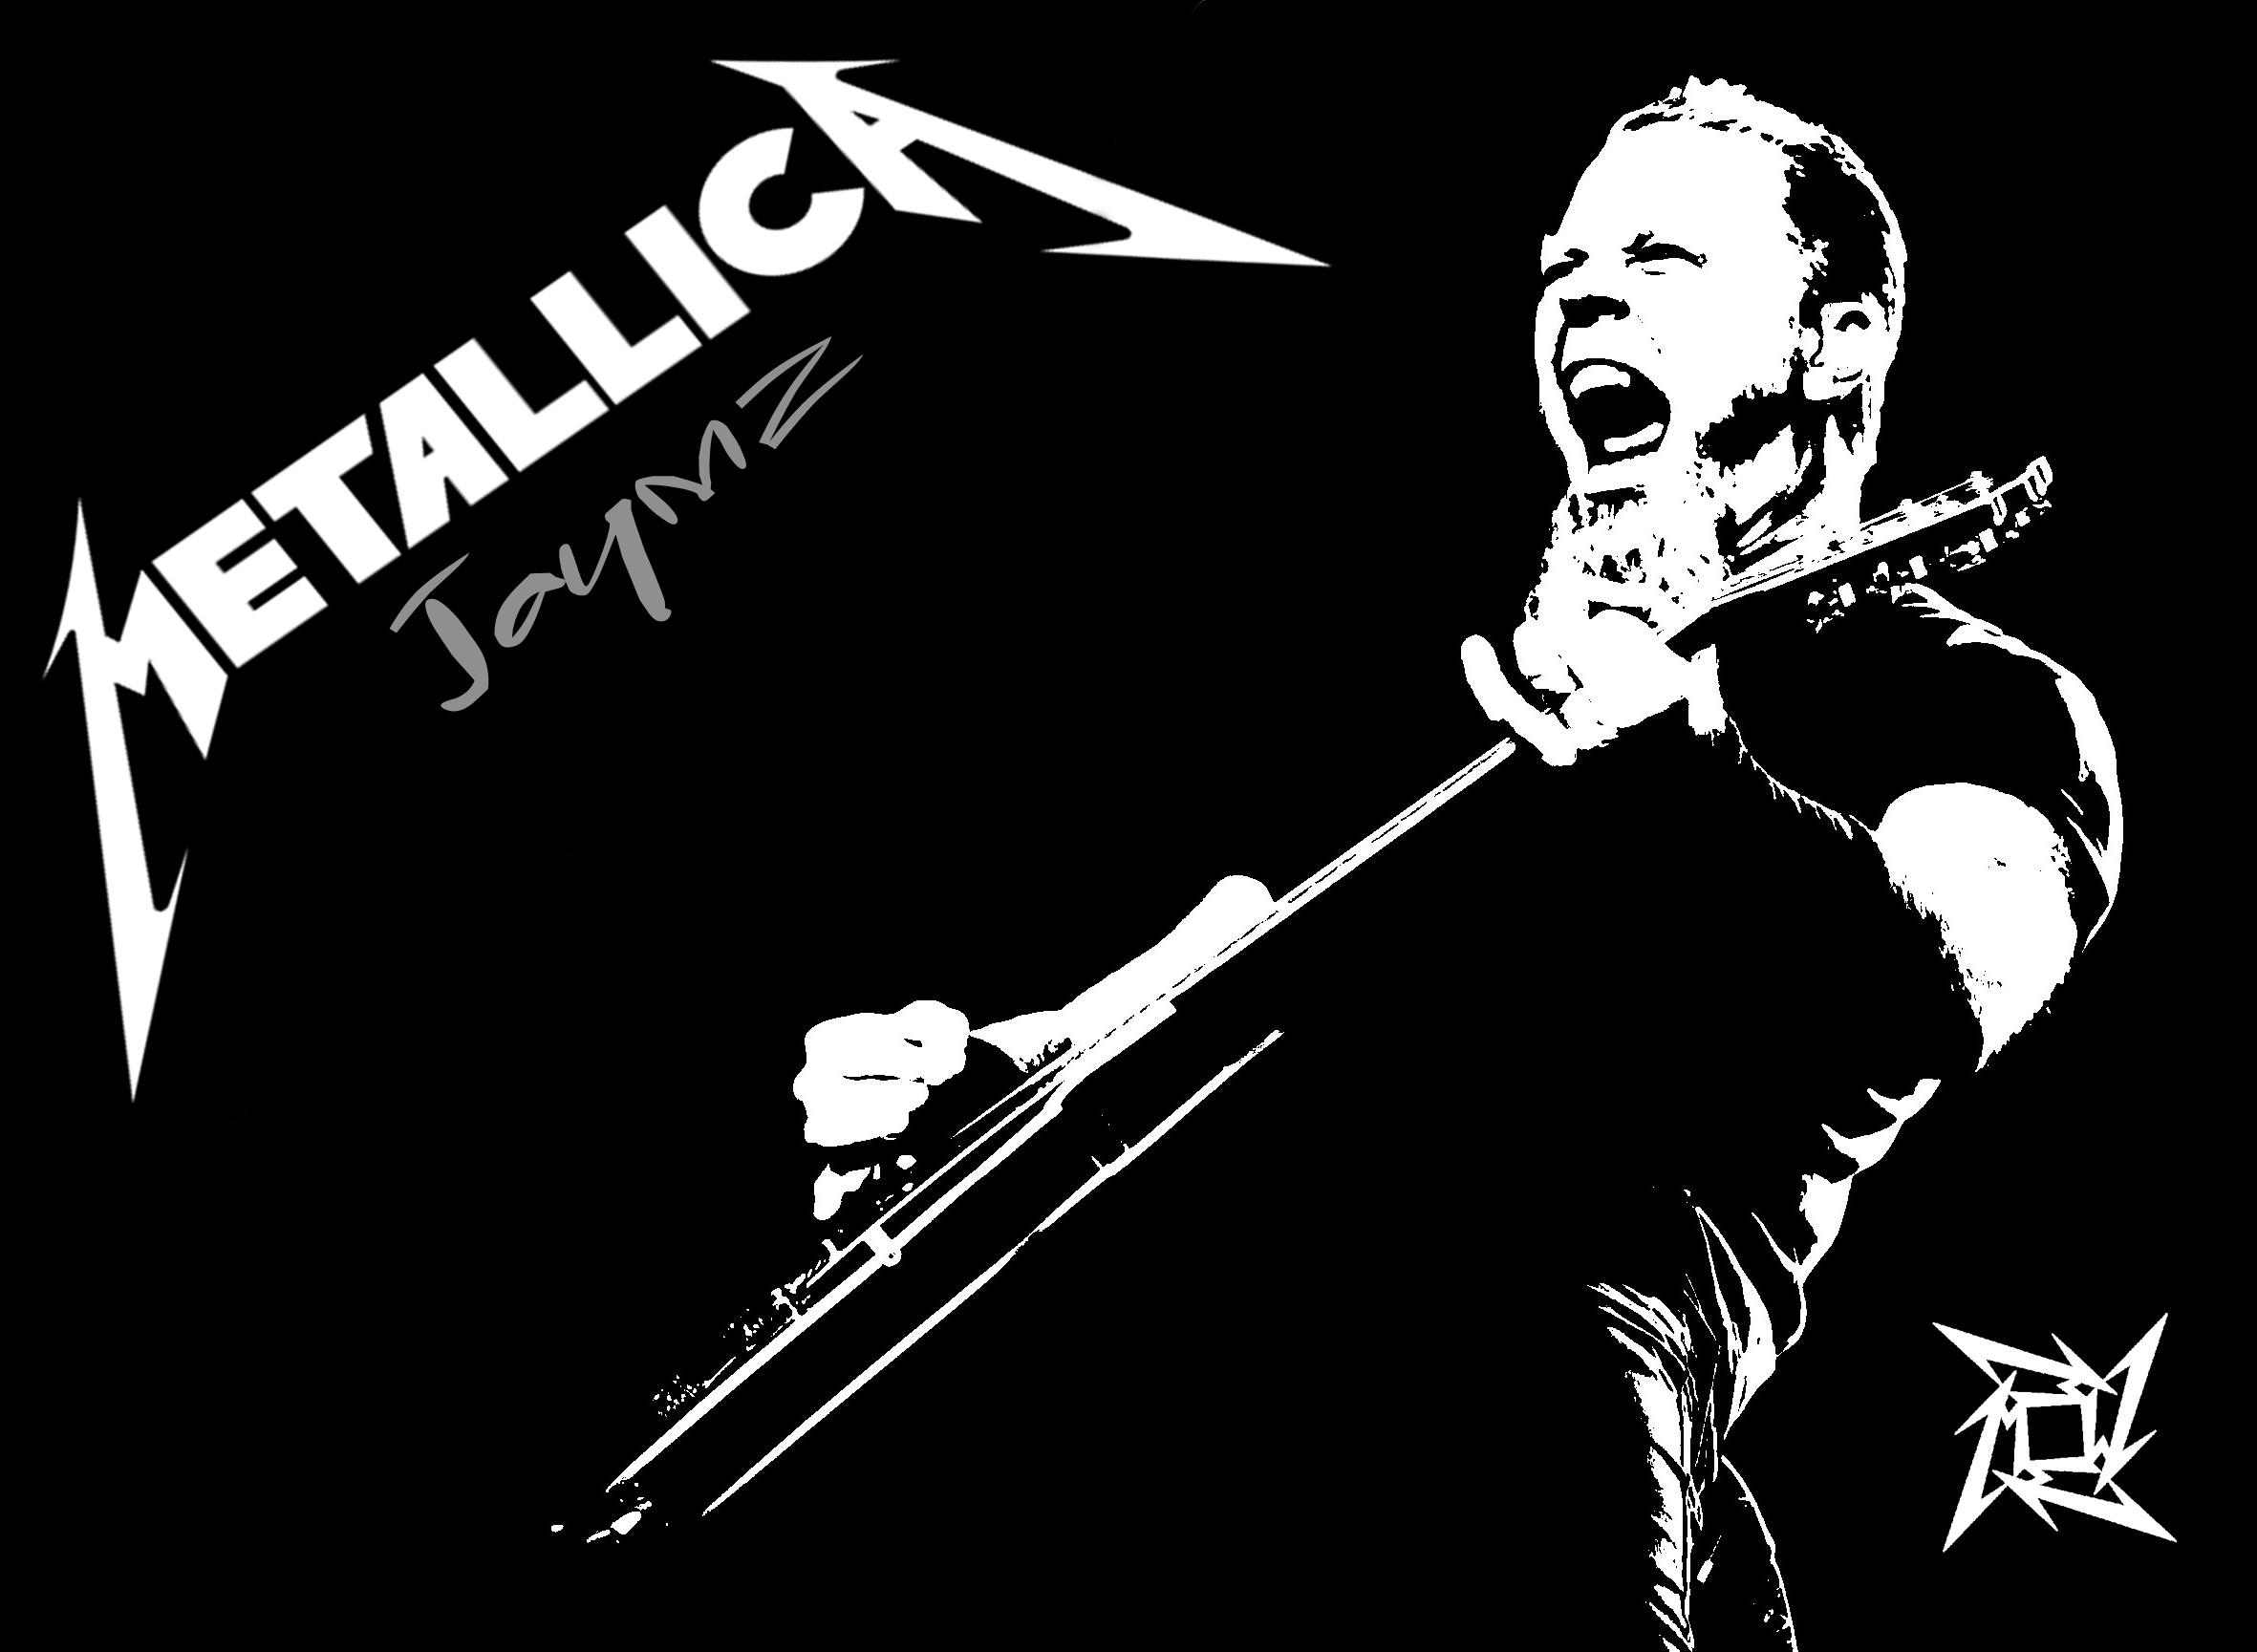 wallpaper.wiki-Free-Download-Metallica-Wallpaper-HD-PIC-